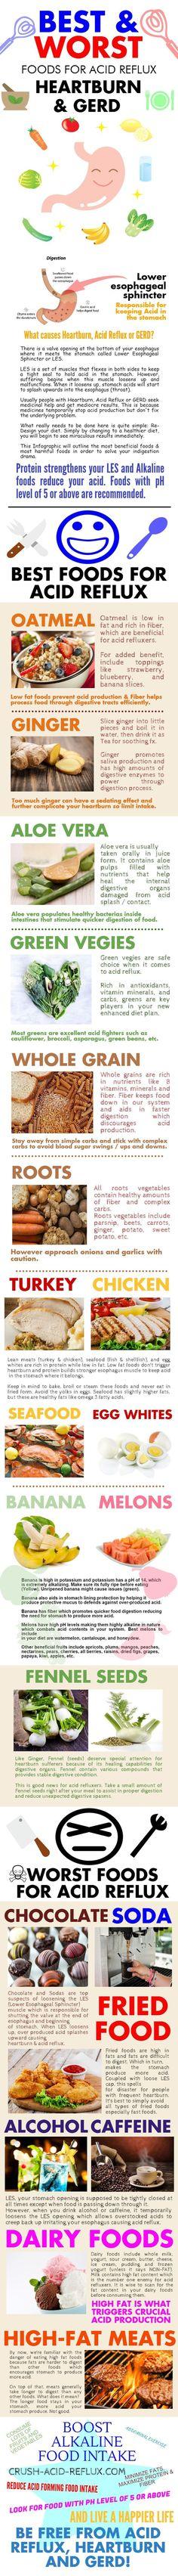 Idk how I'm gonna avoid the bad stuff...here goes...  Infographic: Best & Worst Foods for Acid Reflux, Heartburn, and GERD. #heartburn #acidreflux #GERD